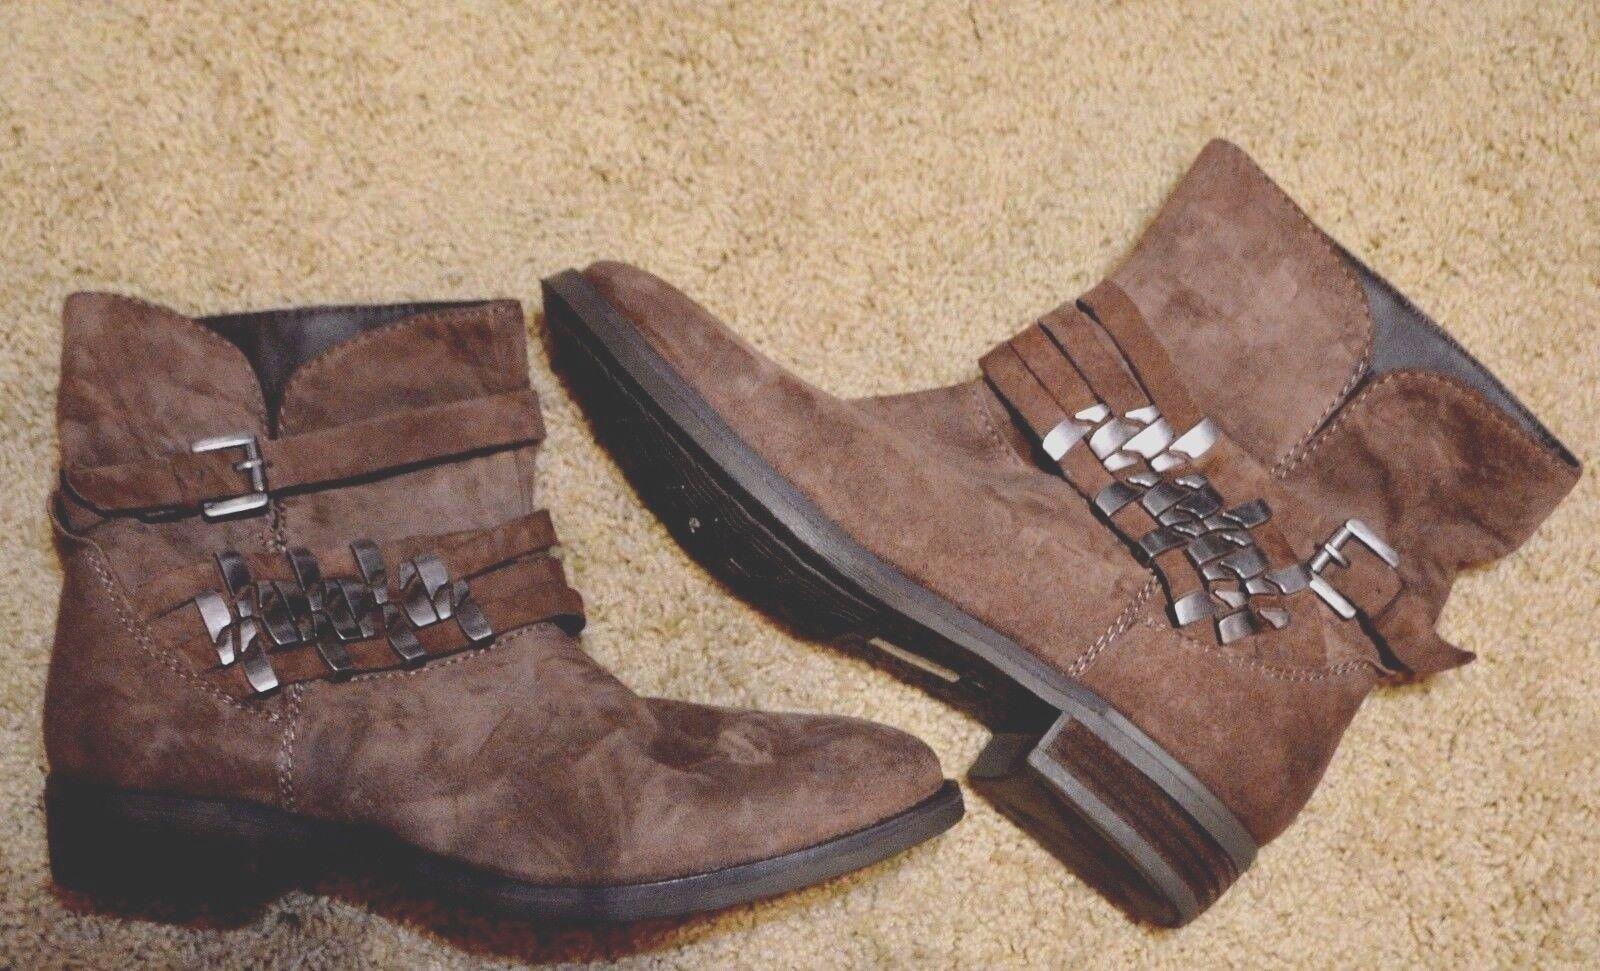 Steven Steve Madden Traker Distressed Light Brown Suede  Ankle Boots Sz.8